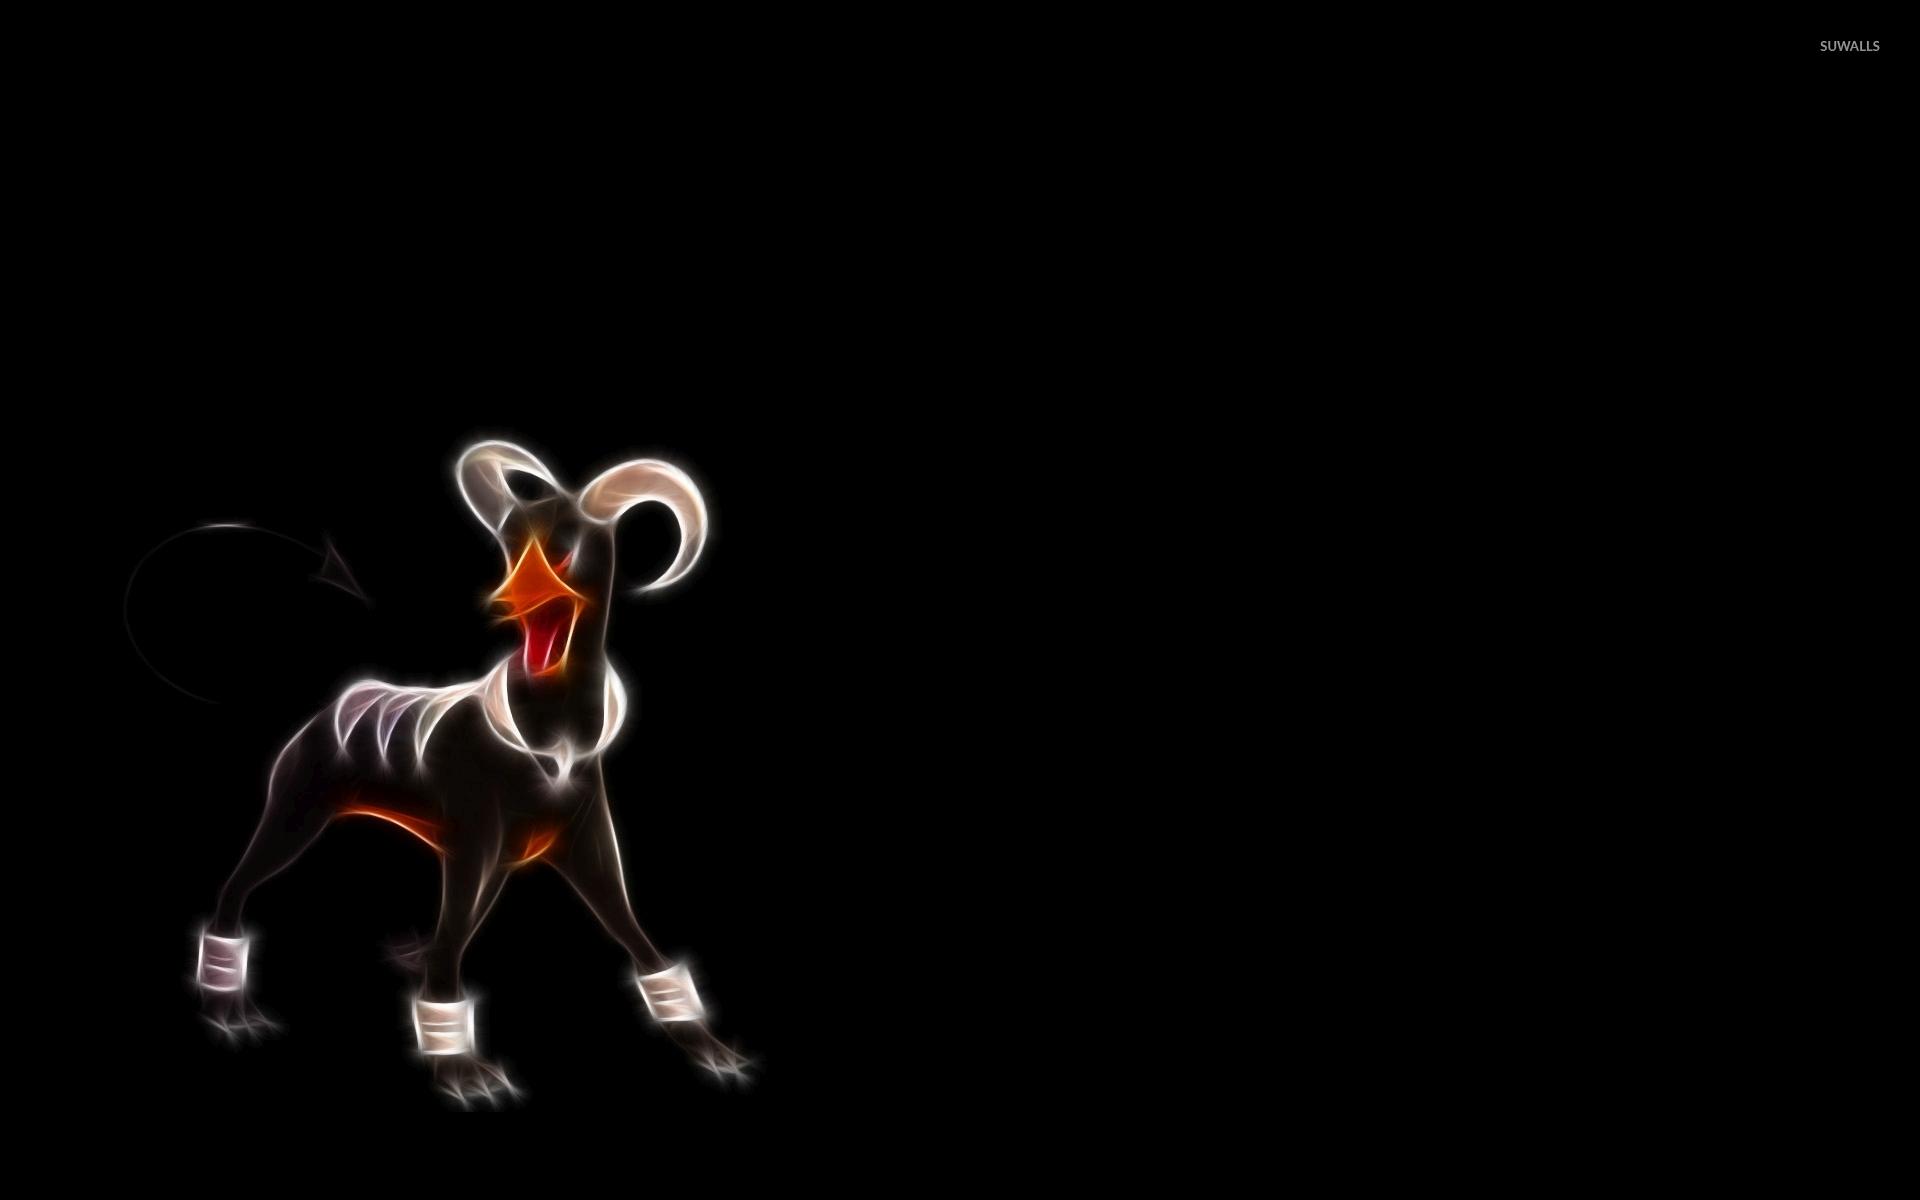 Staraptor - Pokemon wallpaper - Game wallpapers - #35606